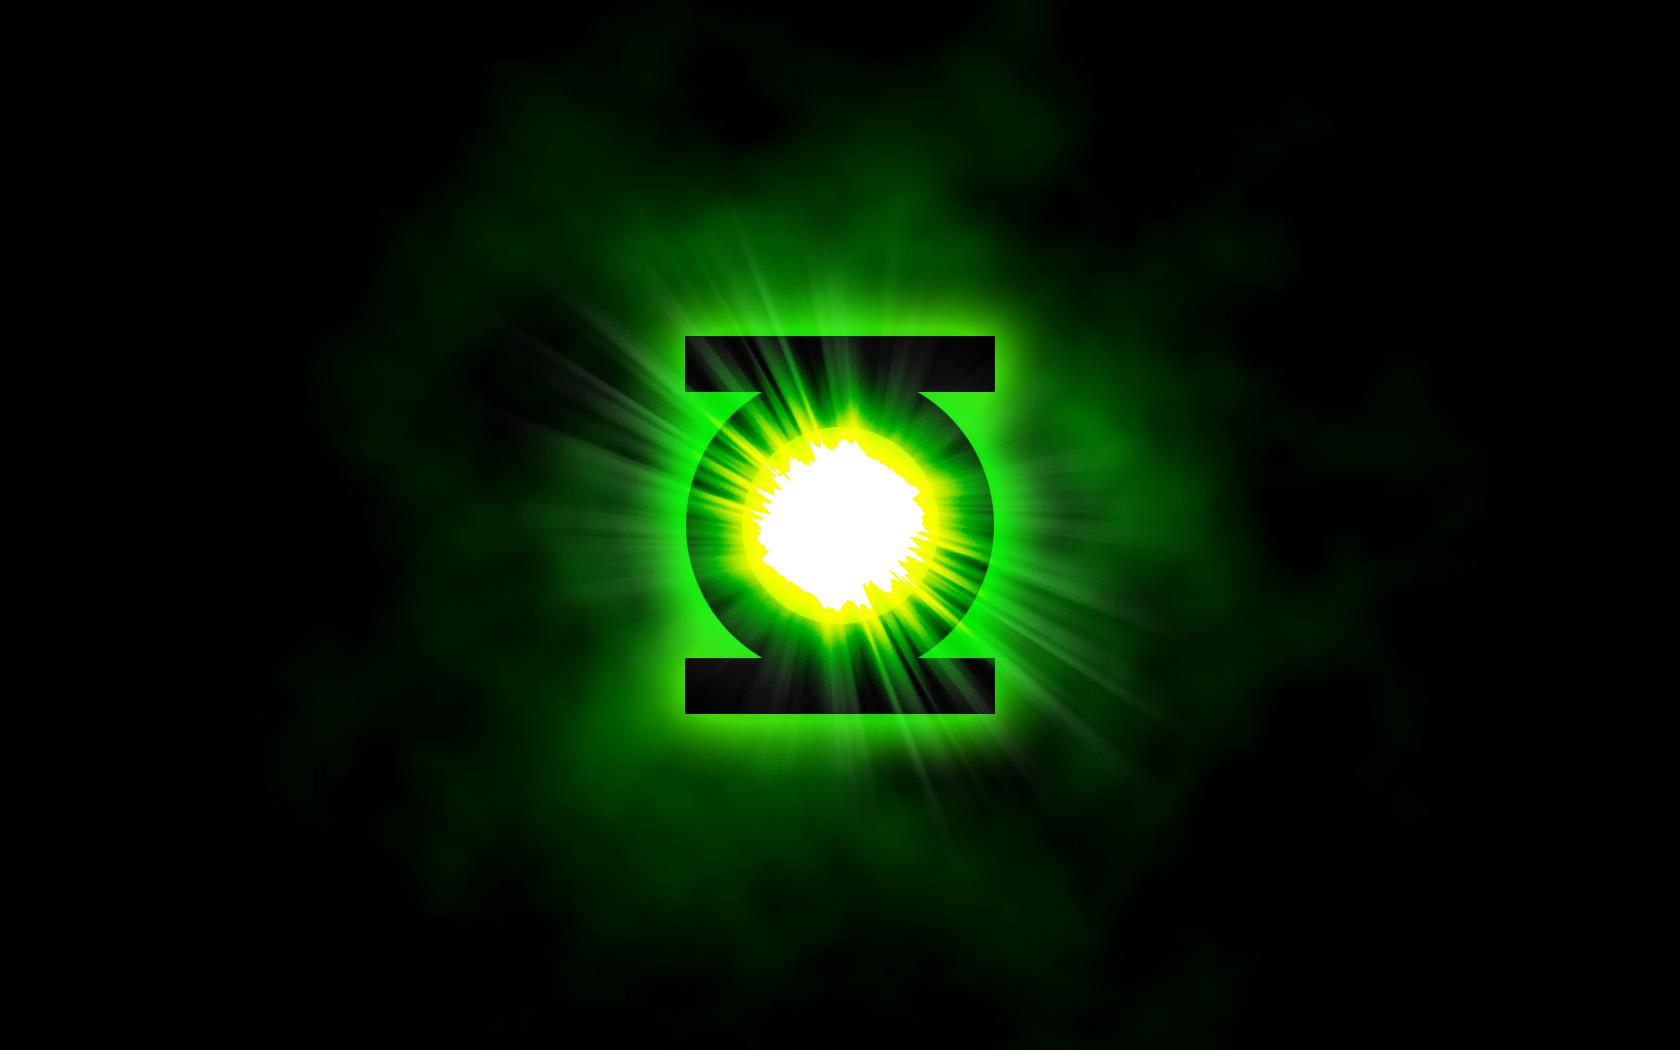 Green Lantern Computer Wallpapers Desktop Backgrounds 1680x1050